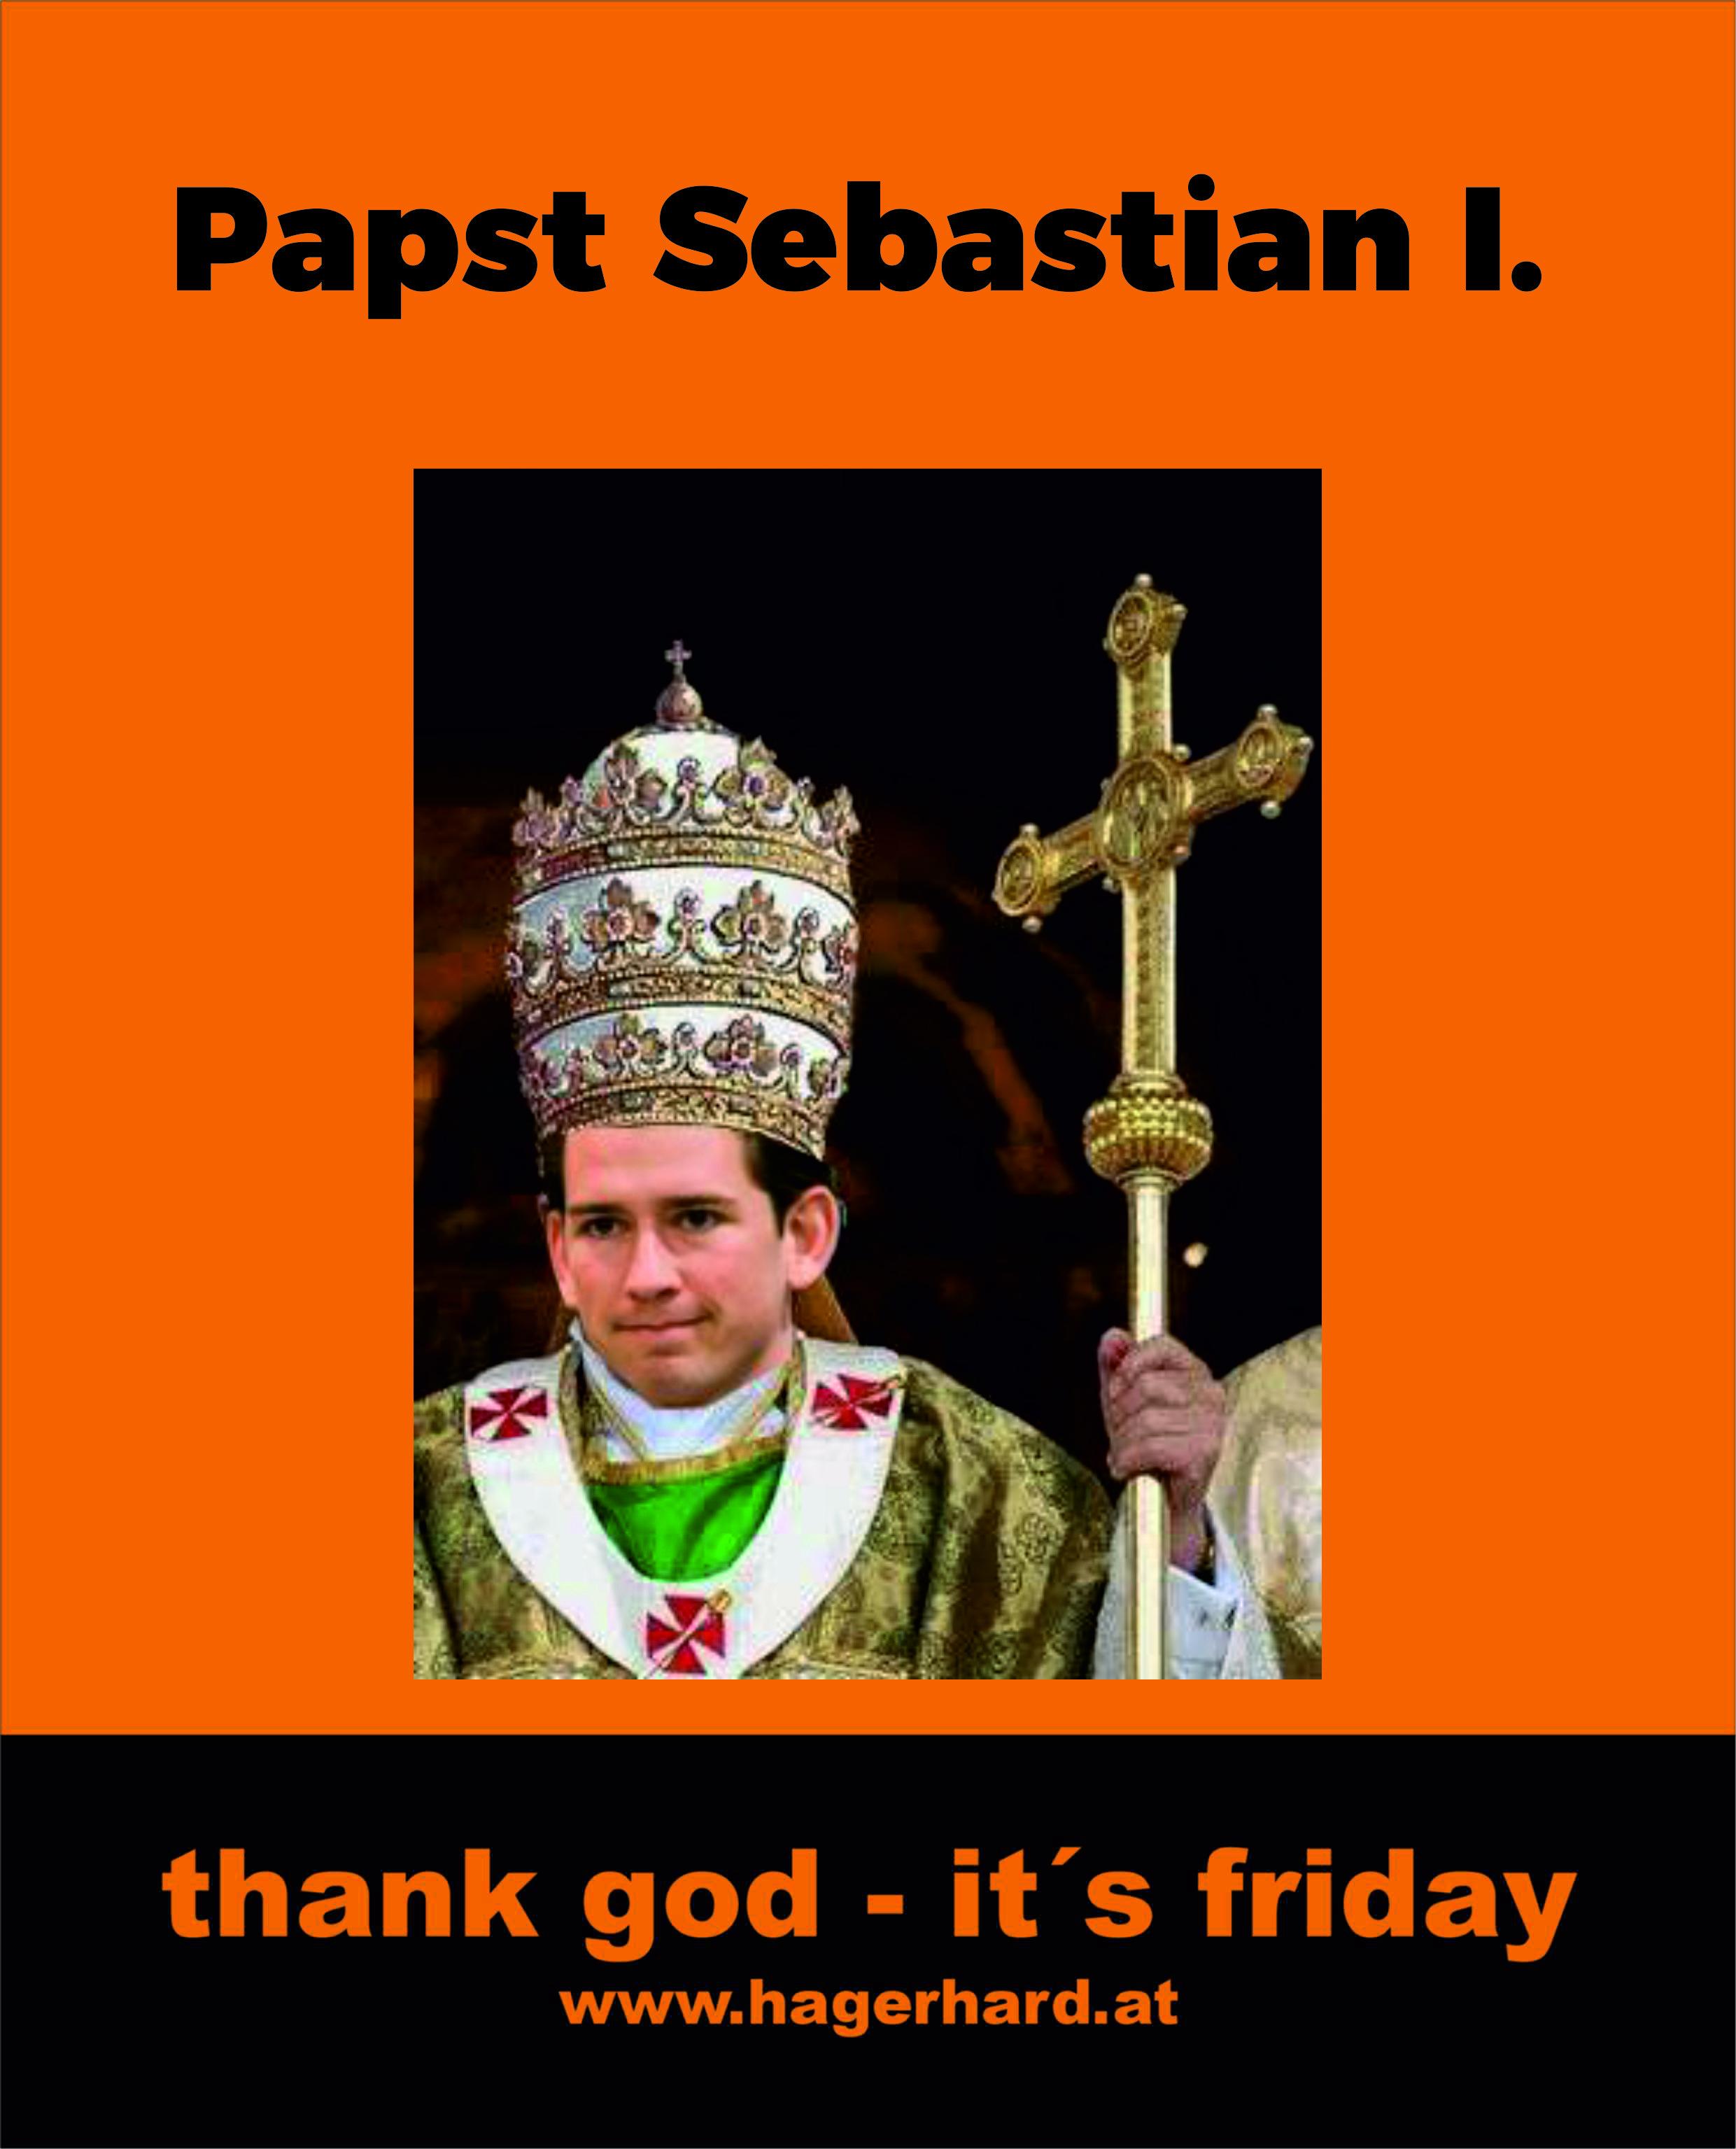 Papst Sebastian I.